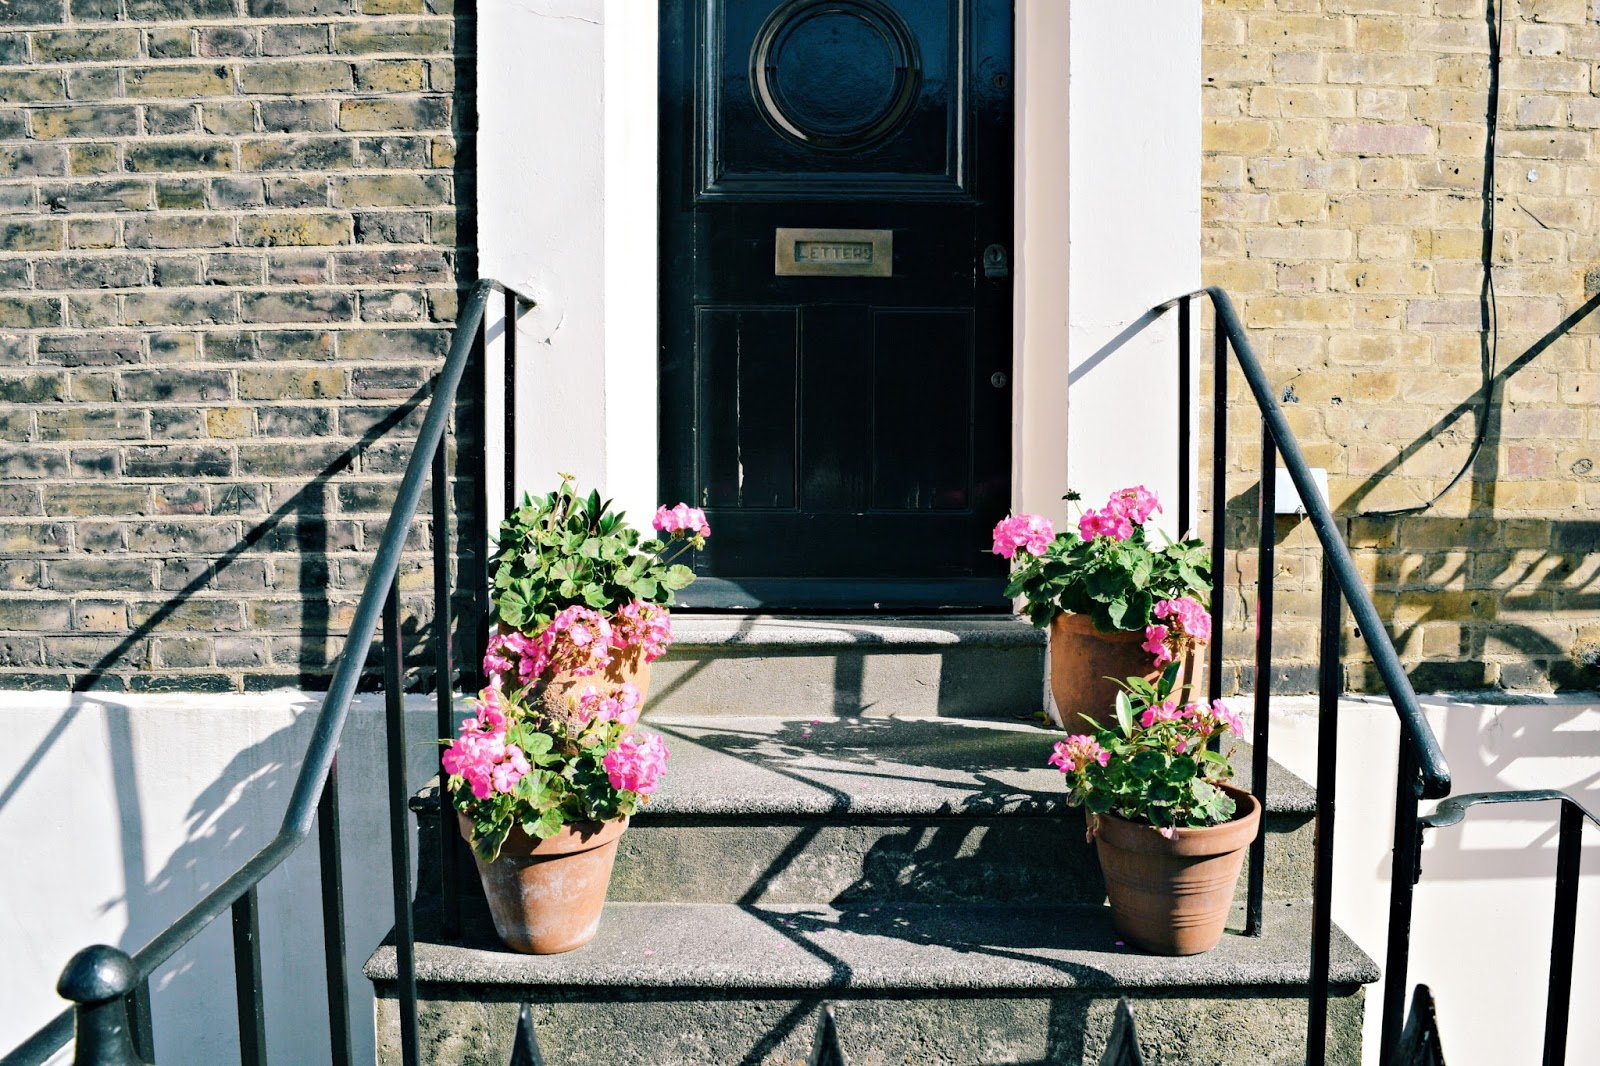 london lifestyle blog travel london